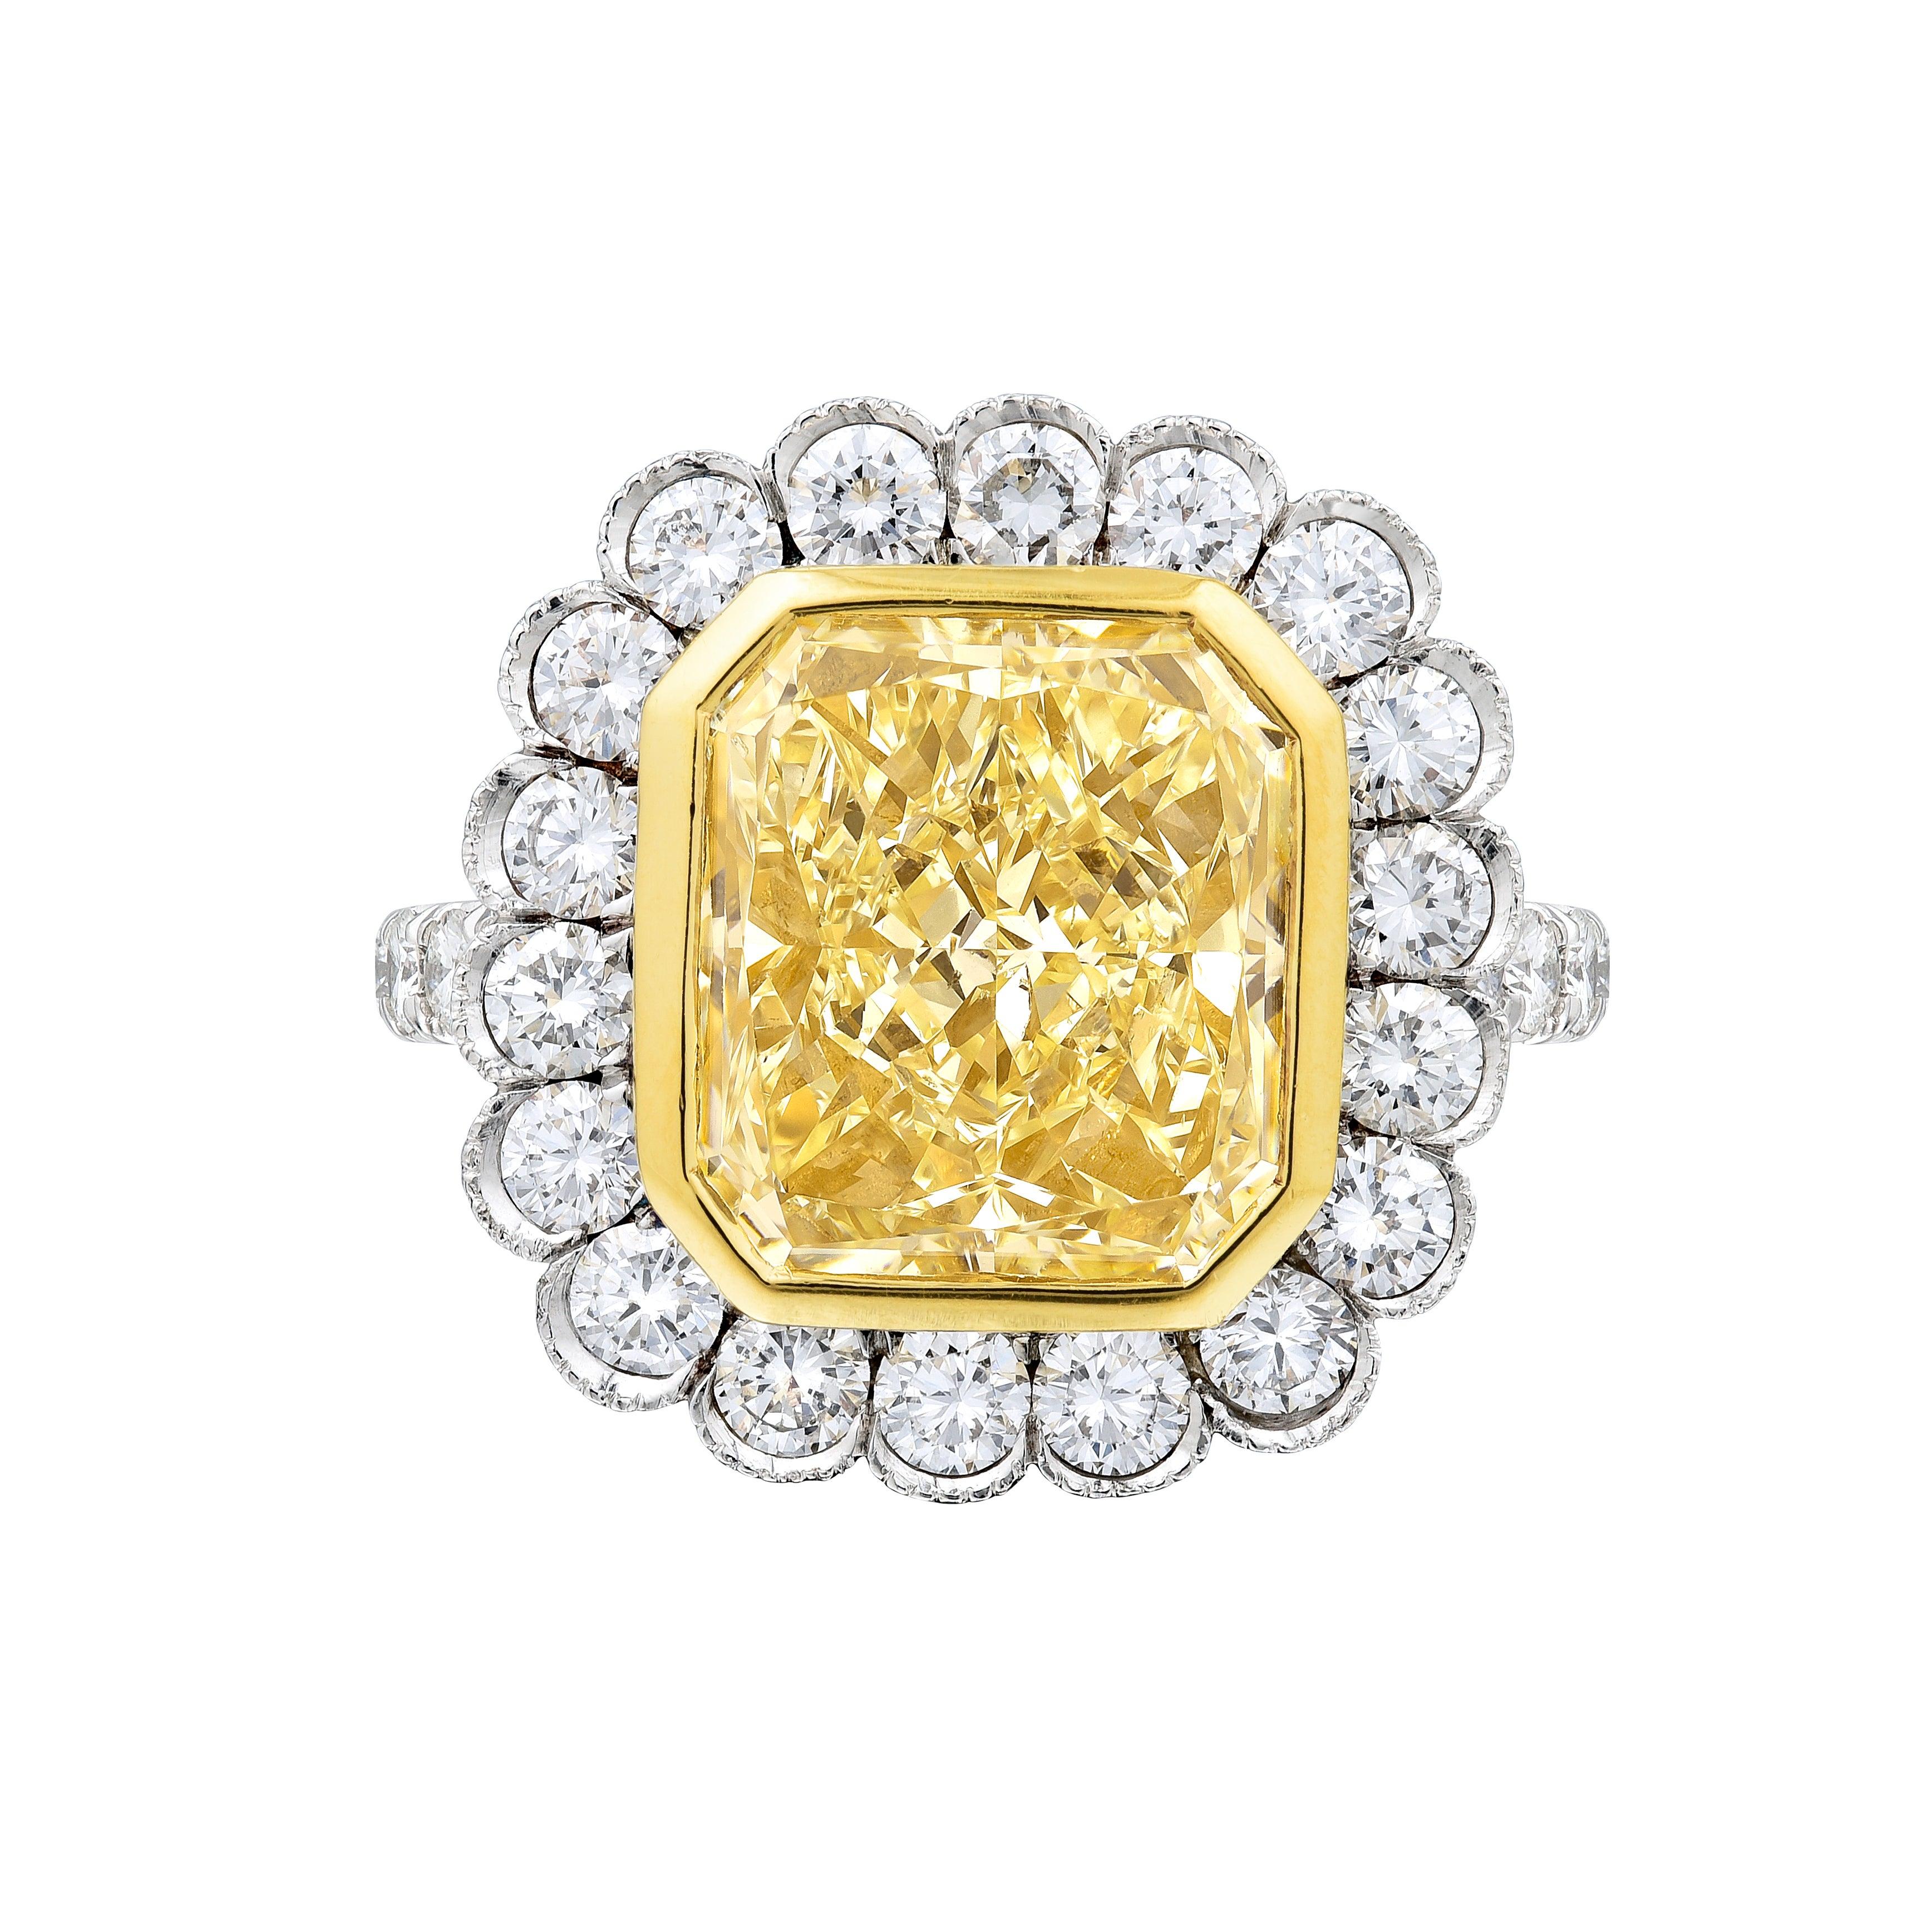 GIA Certified 4.02 Carat Radiant Fancy Yellow Diamond Engagement Platinum Ring